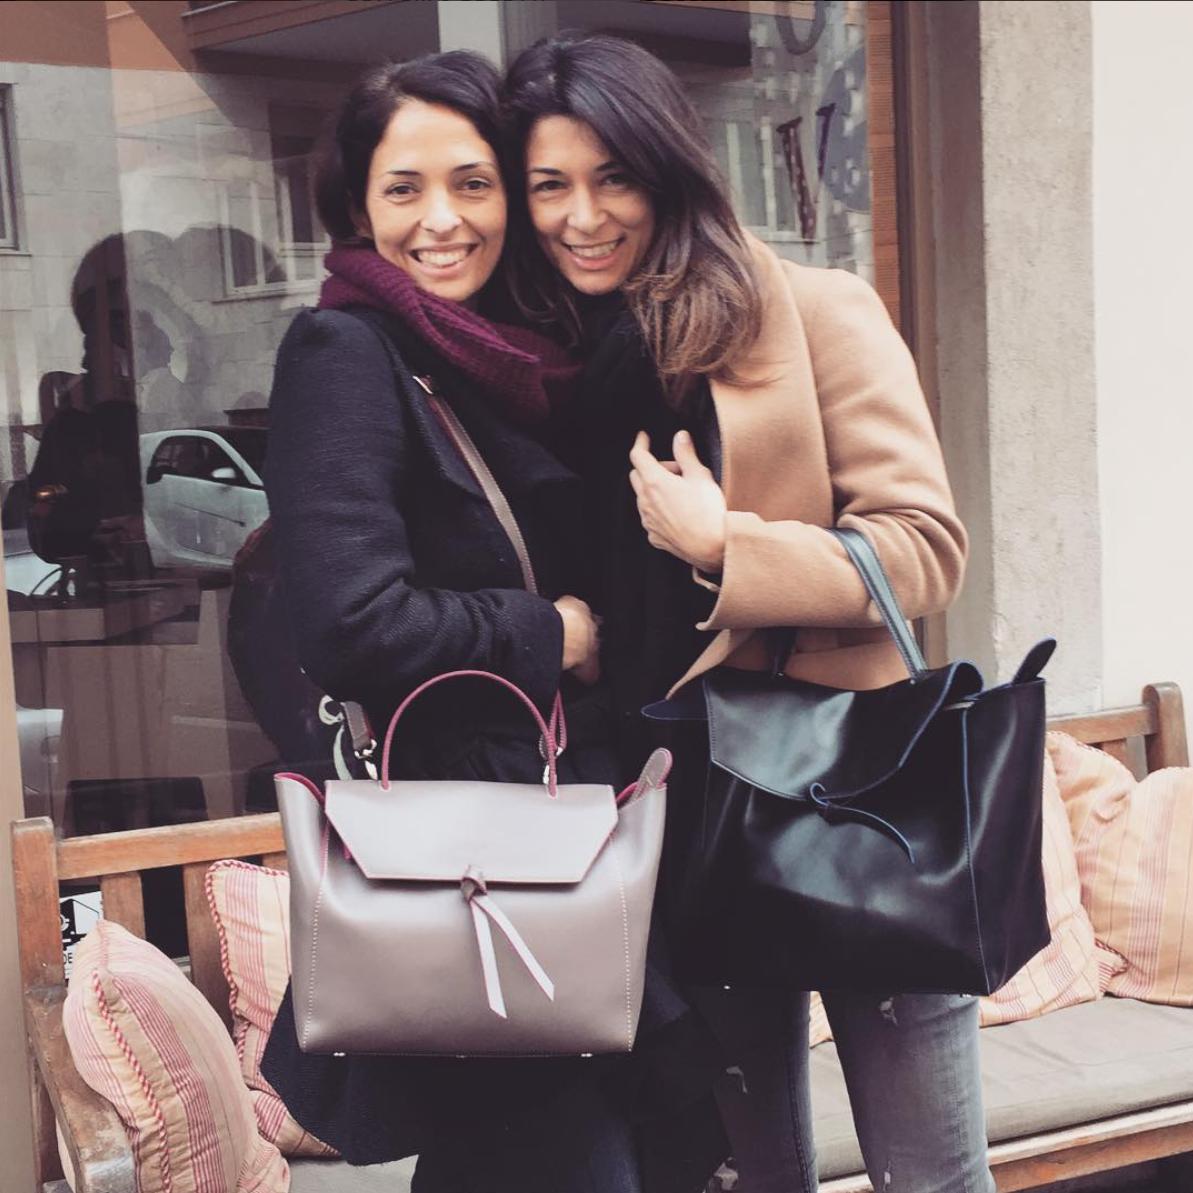 @alexandradecurtis Alexandra and her sister Giulia - #Satchel twins!